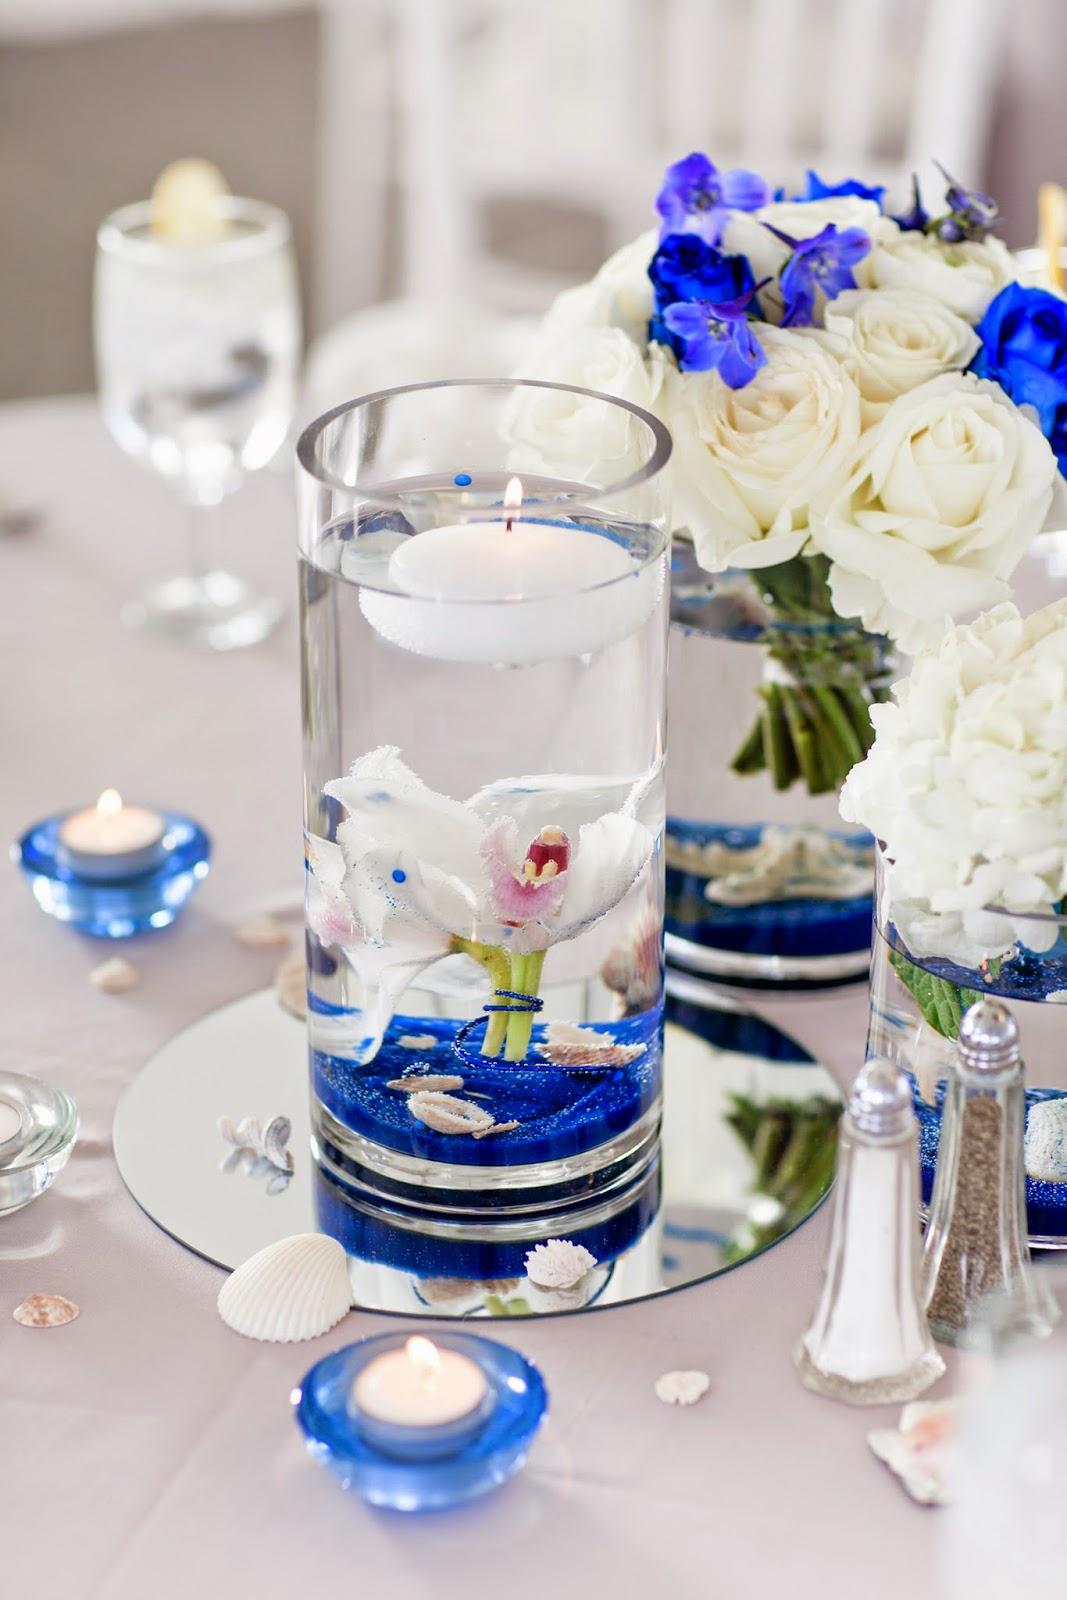 Beach+wedding+decor+centerpiece - wedding beach centerpieces